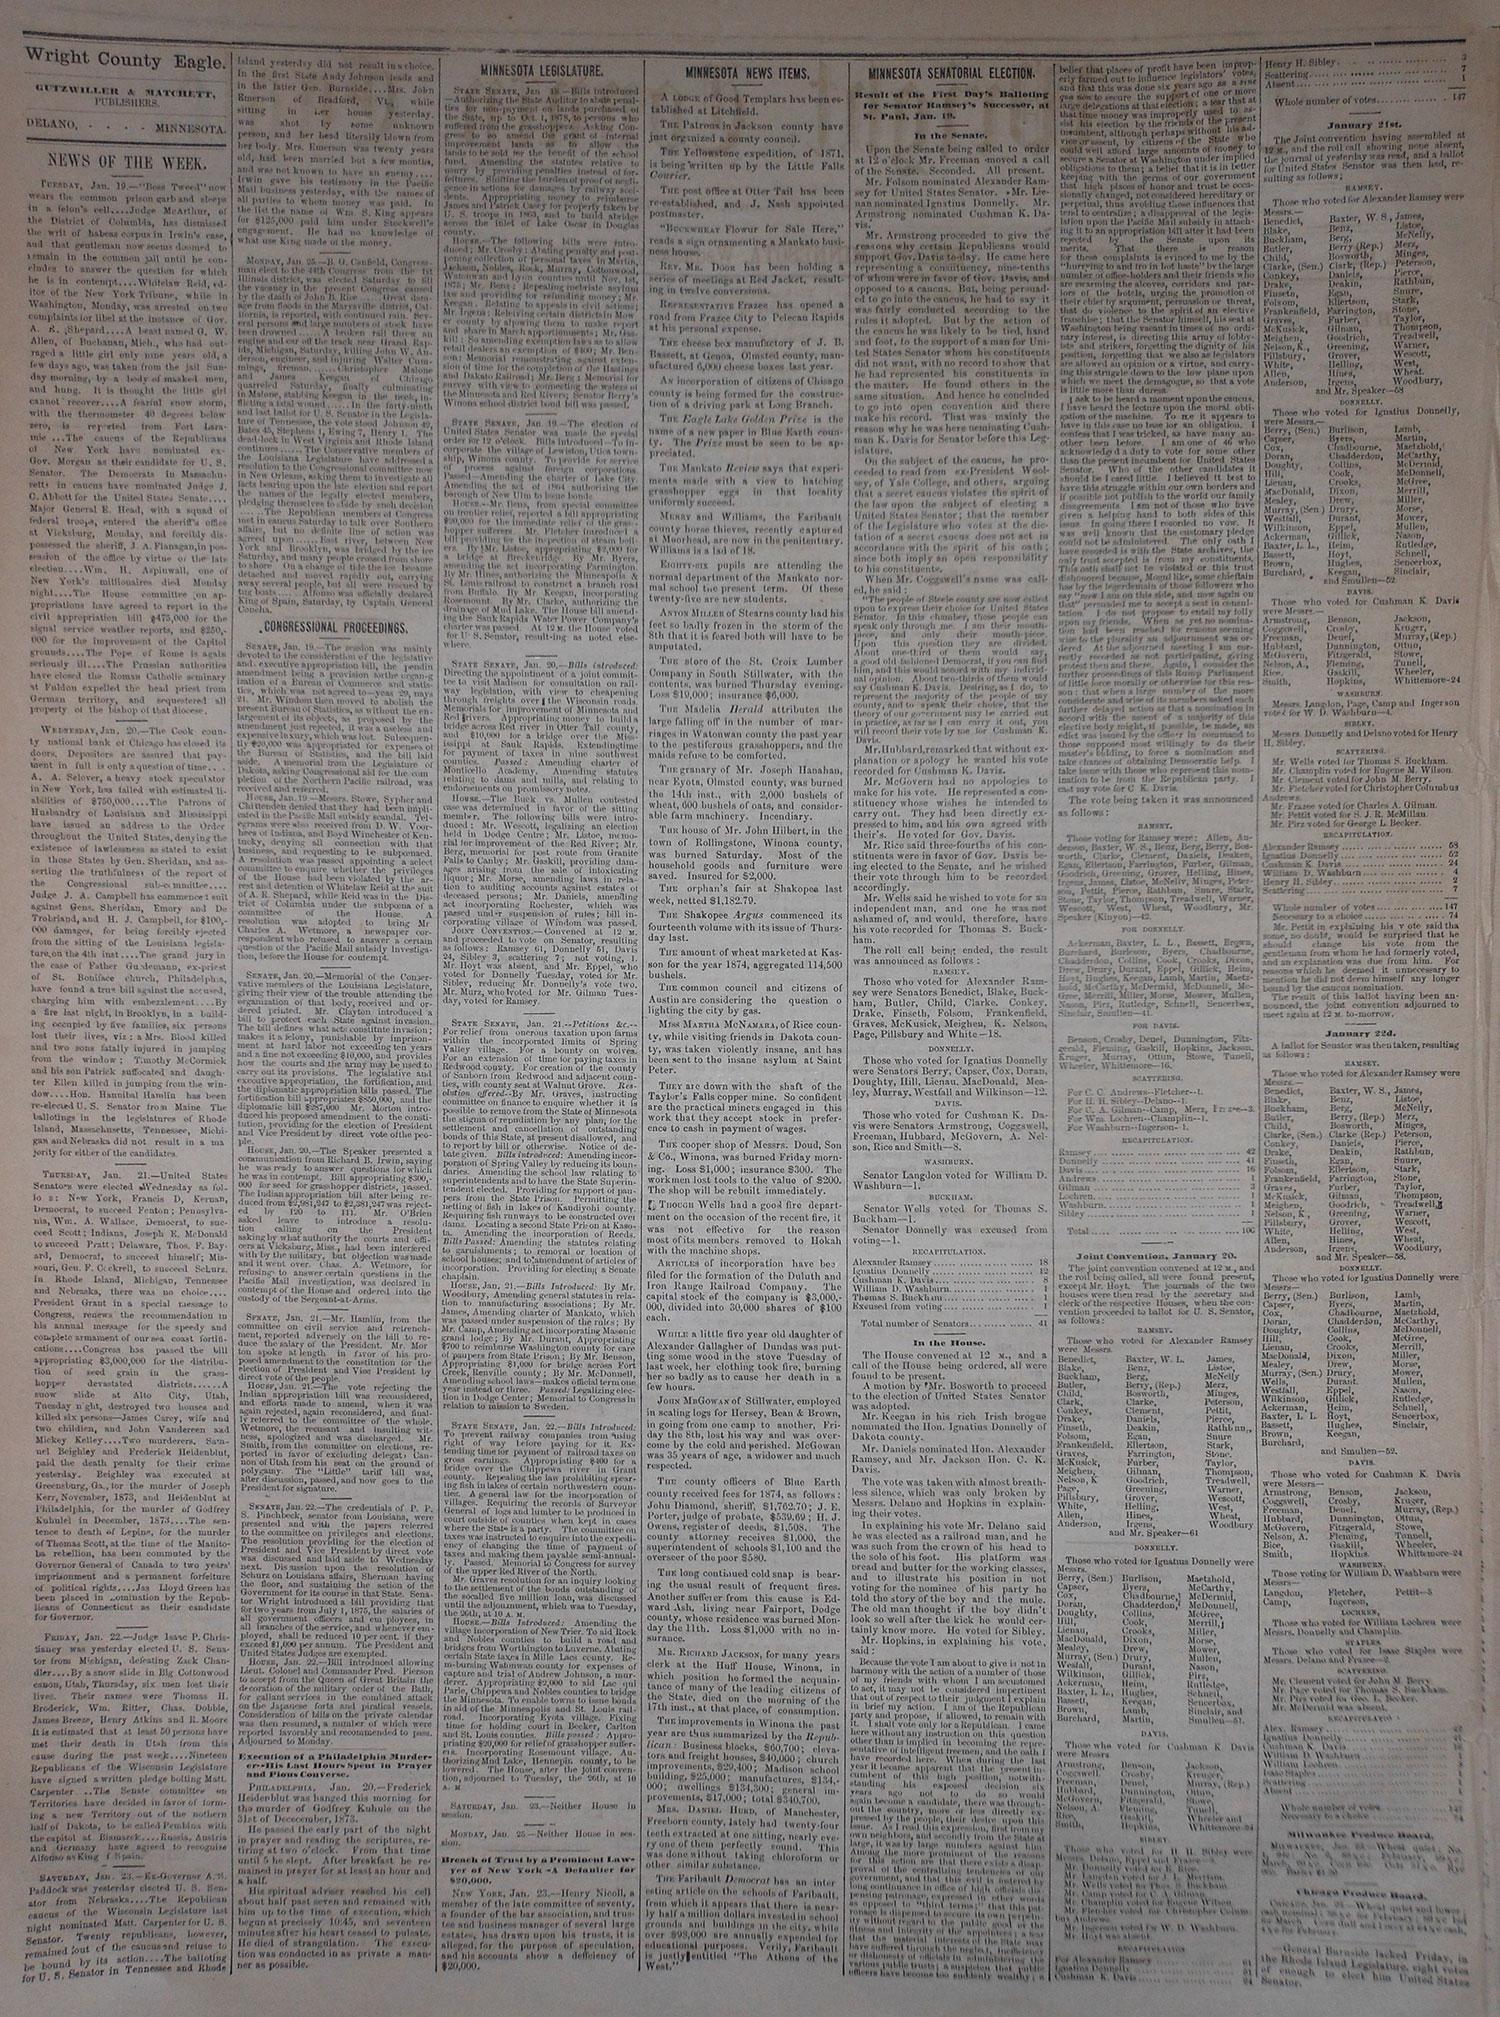 1/27/1875, p2